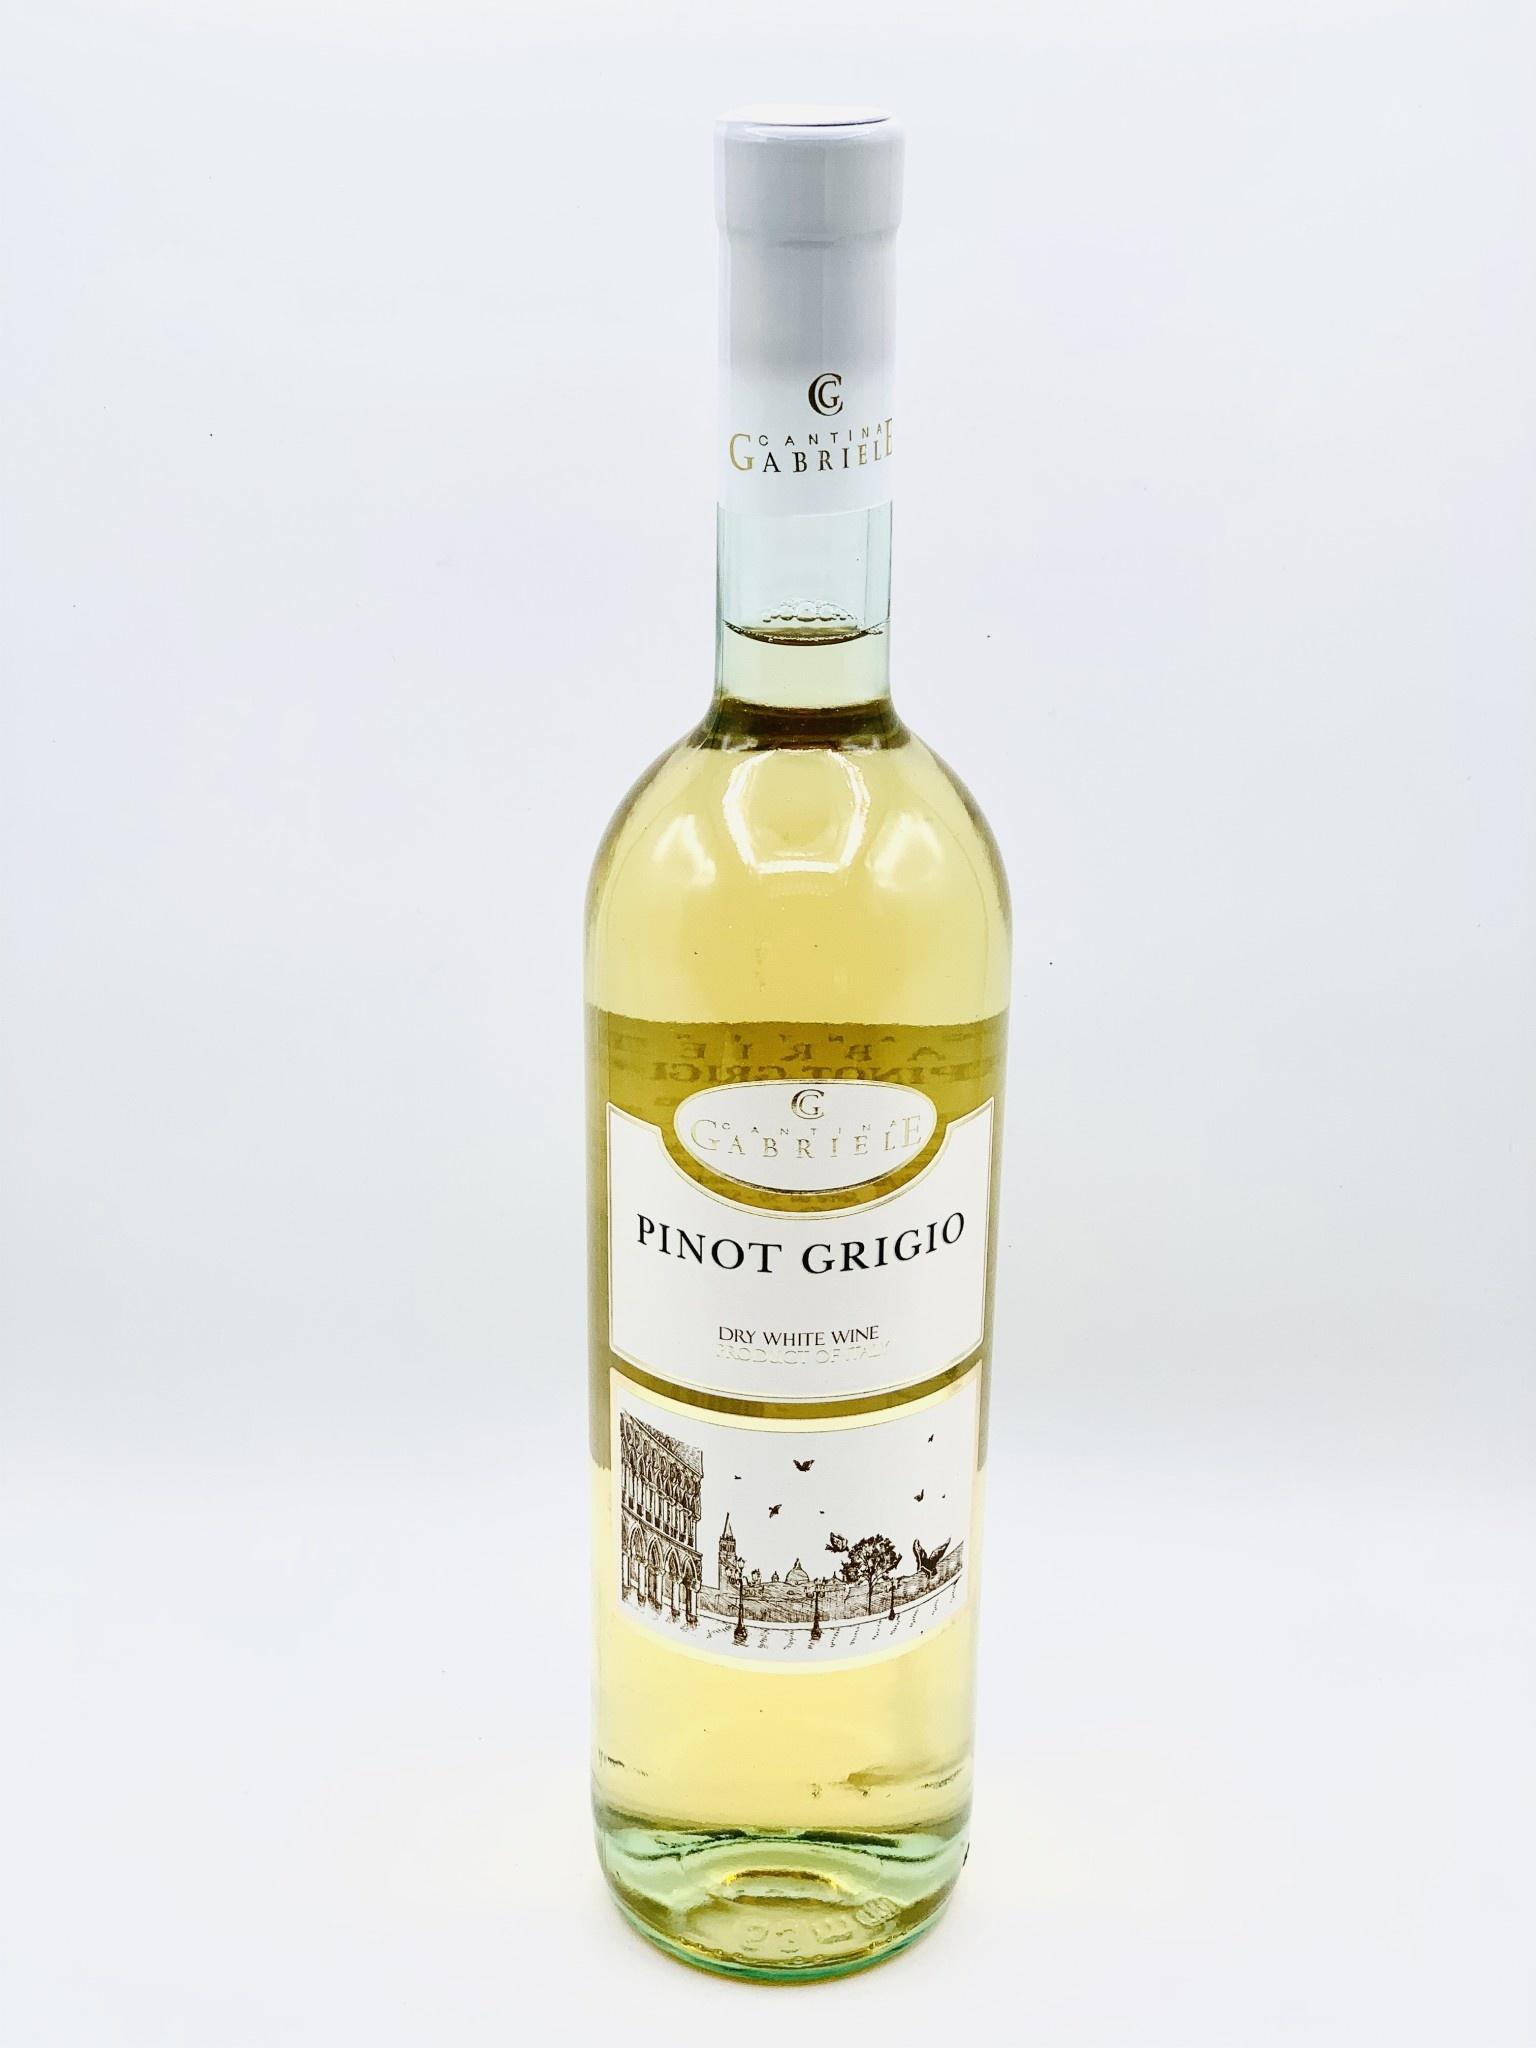 Lazio Pinot Grigio 2018 Cantina Gabriele (Kosher) 750ml